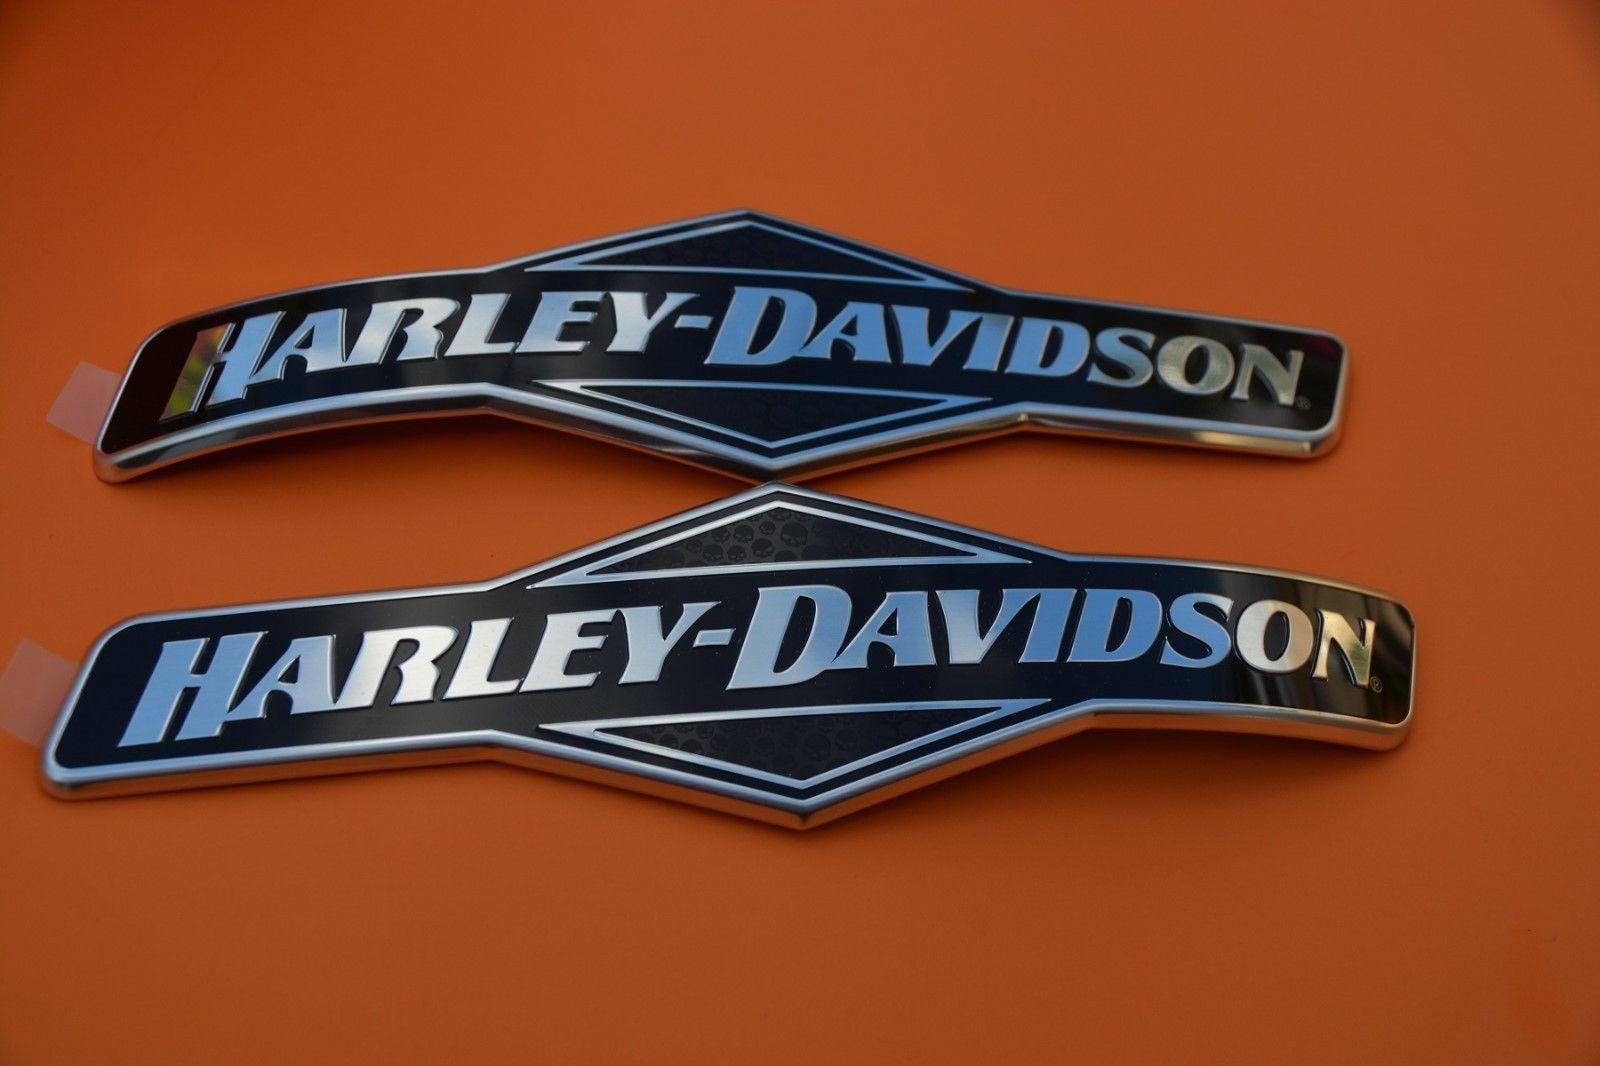 Genuine Harley Davidson Fuel Gas Tank Emblems Emblem Badges Right Left 104 95 Harley Davidson Harley Gas Tanks [ 1066 x 1600 Pixel ]